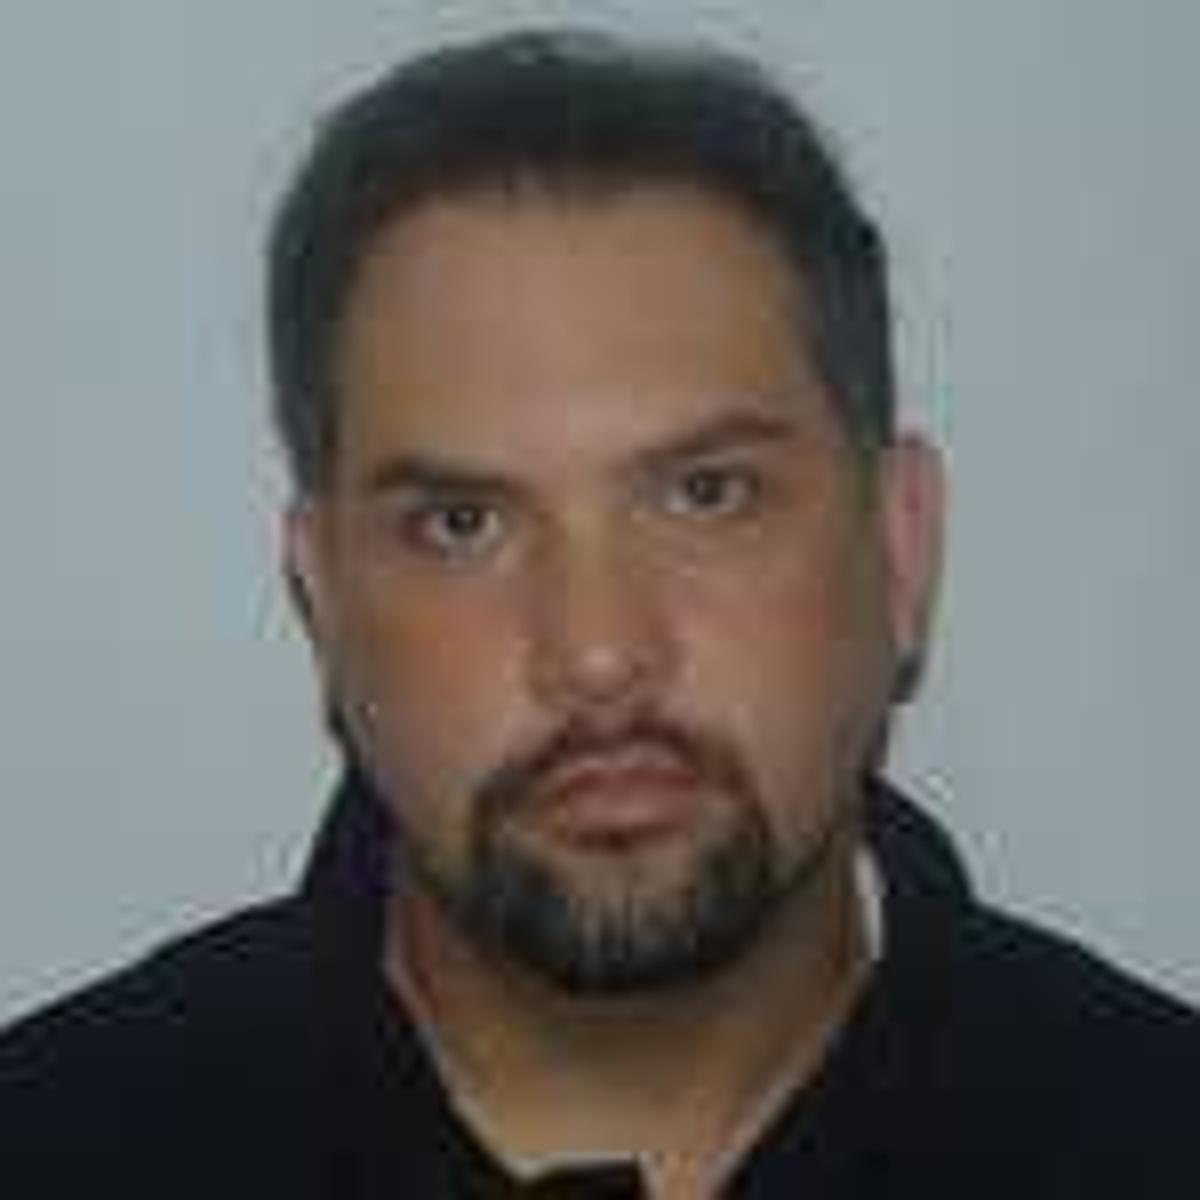 Franklinton man accused of sexual behavior with juveniles